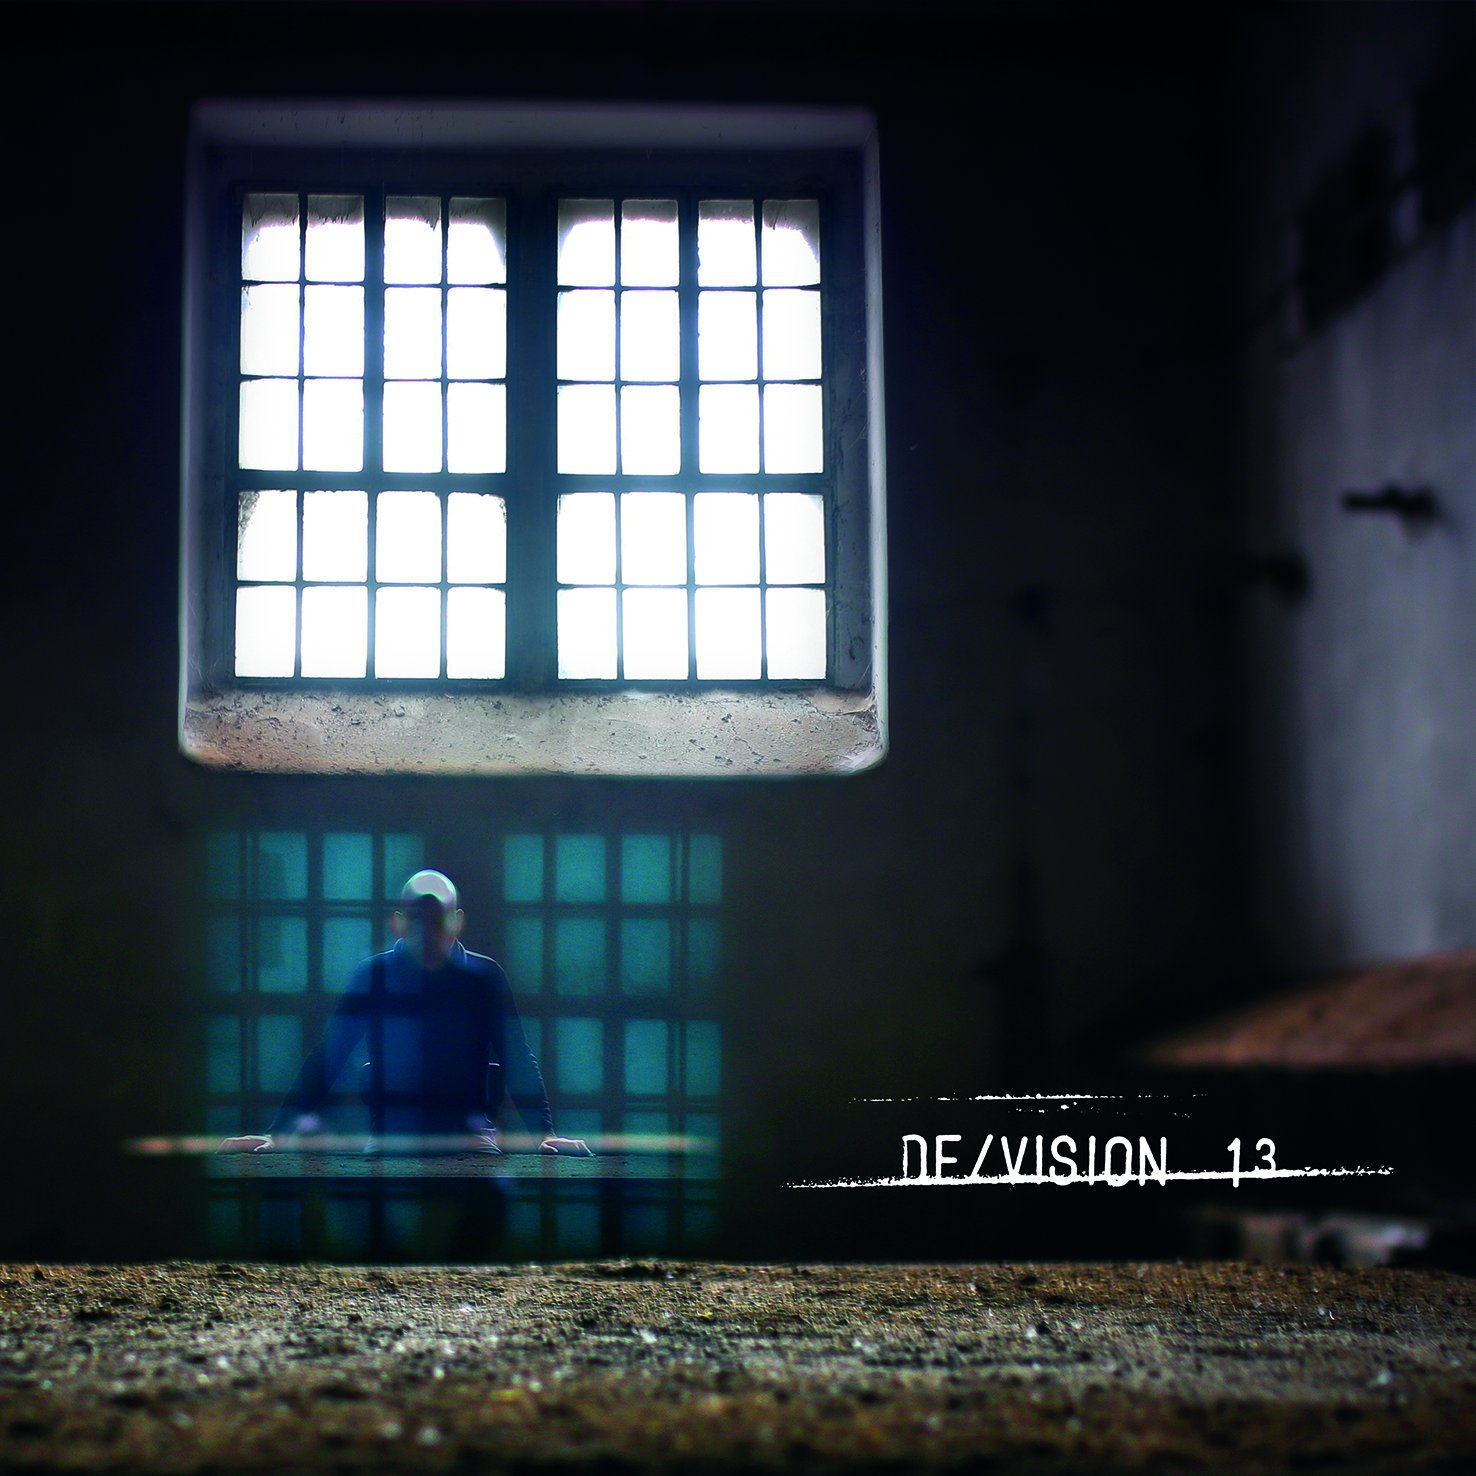 DE/VISION 13 (Digisleeve Edition) CD 2016 (VÖ 17.06)